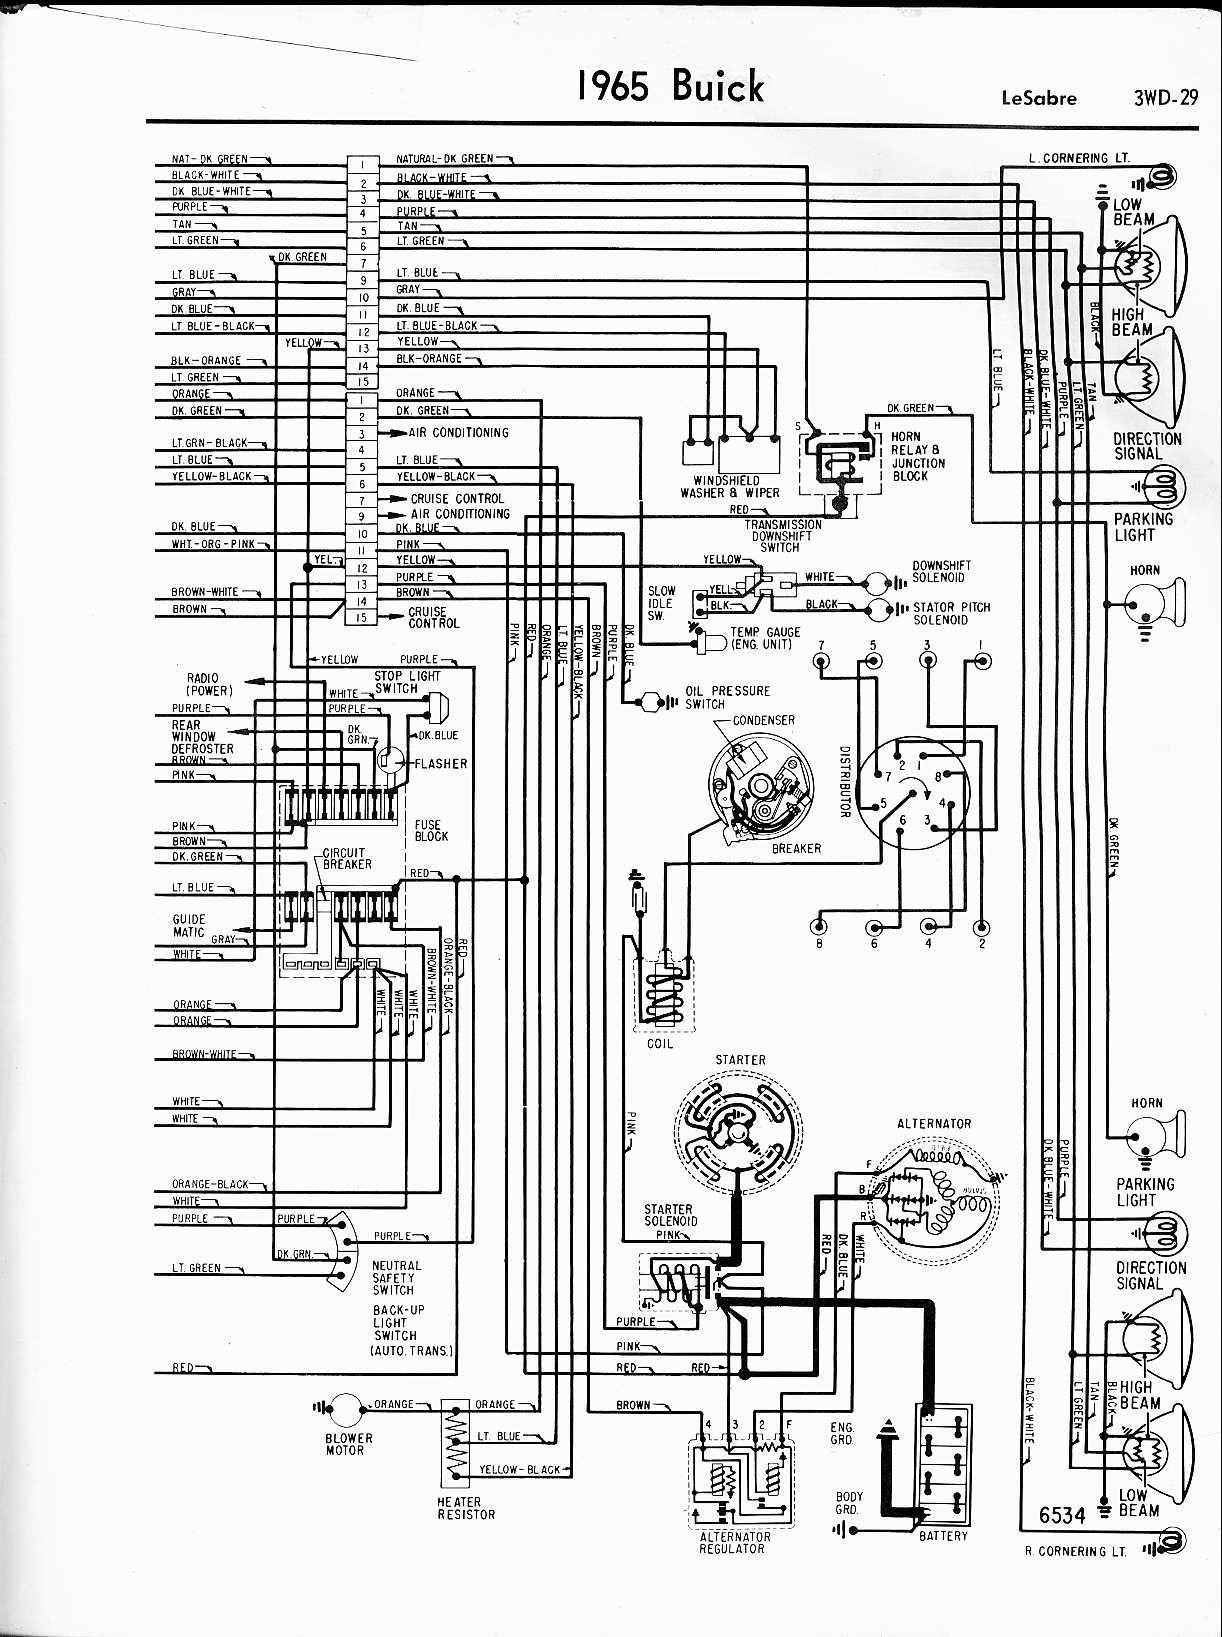 Diesel Engine Starter Wiring Diagram 1972 Corvette Wiper Wiring Diagram 1959 Corvette Starter Wiring Of Diesel Engine Starter Wiring Diagram